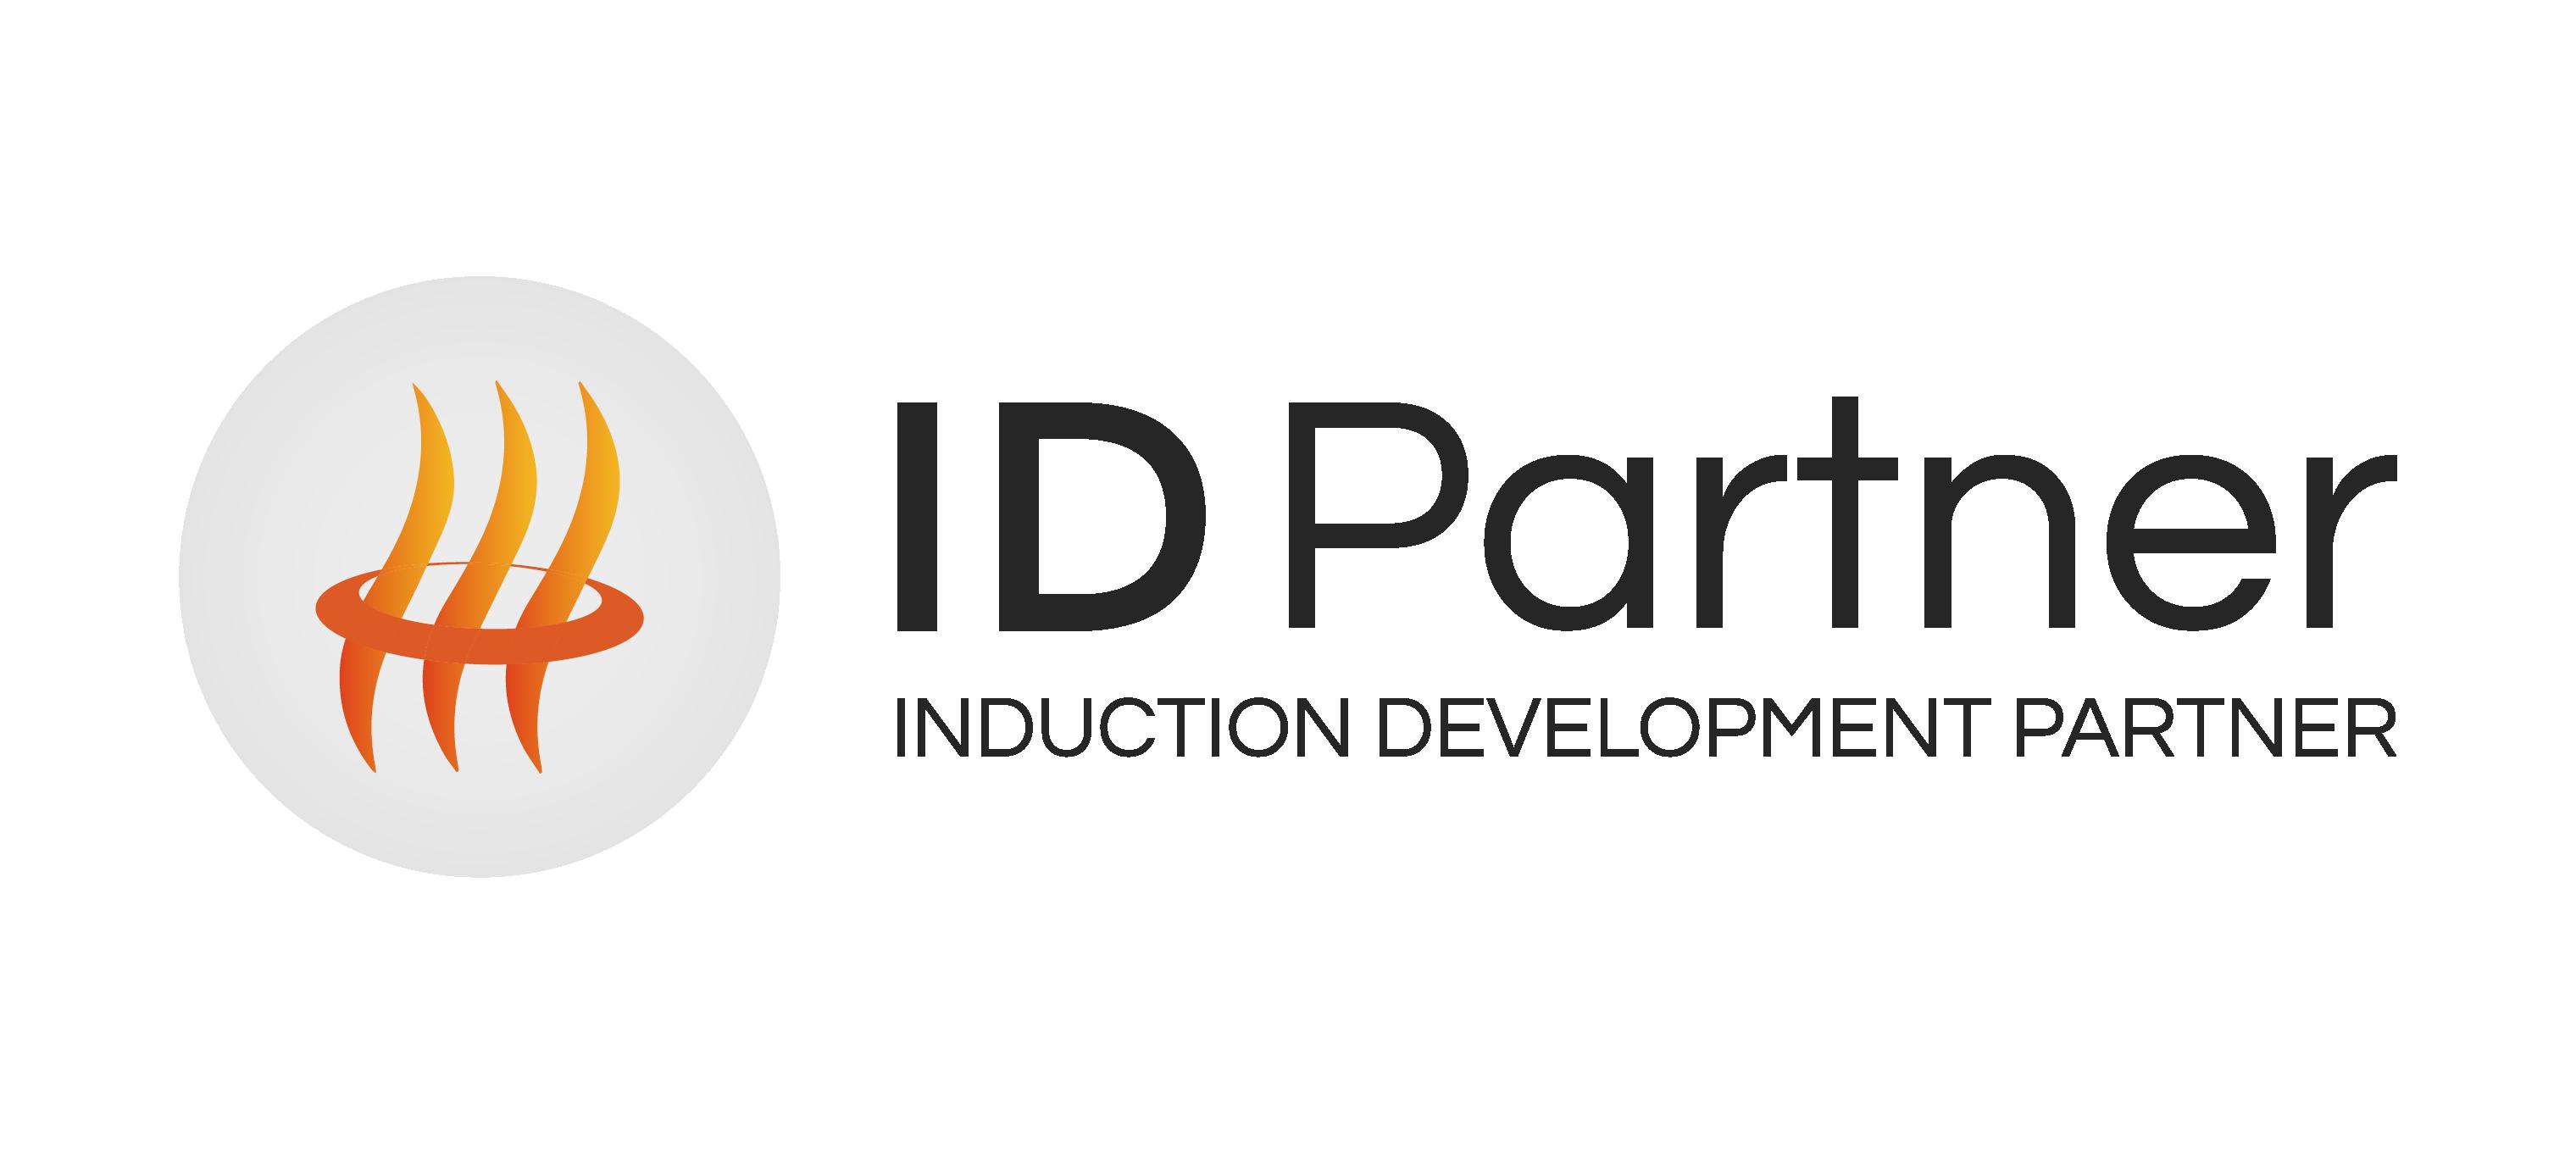 Induction Development Partner - IDP